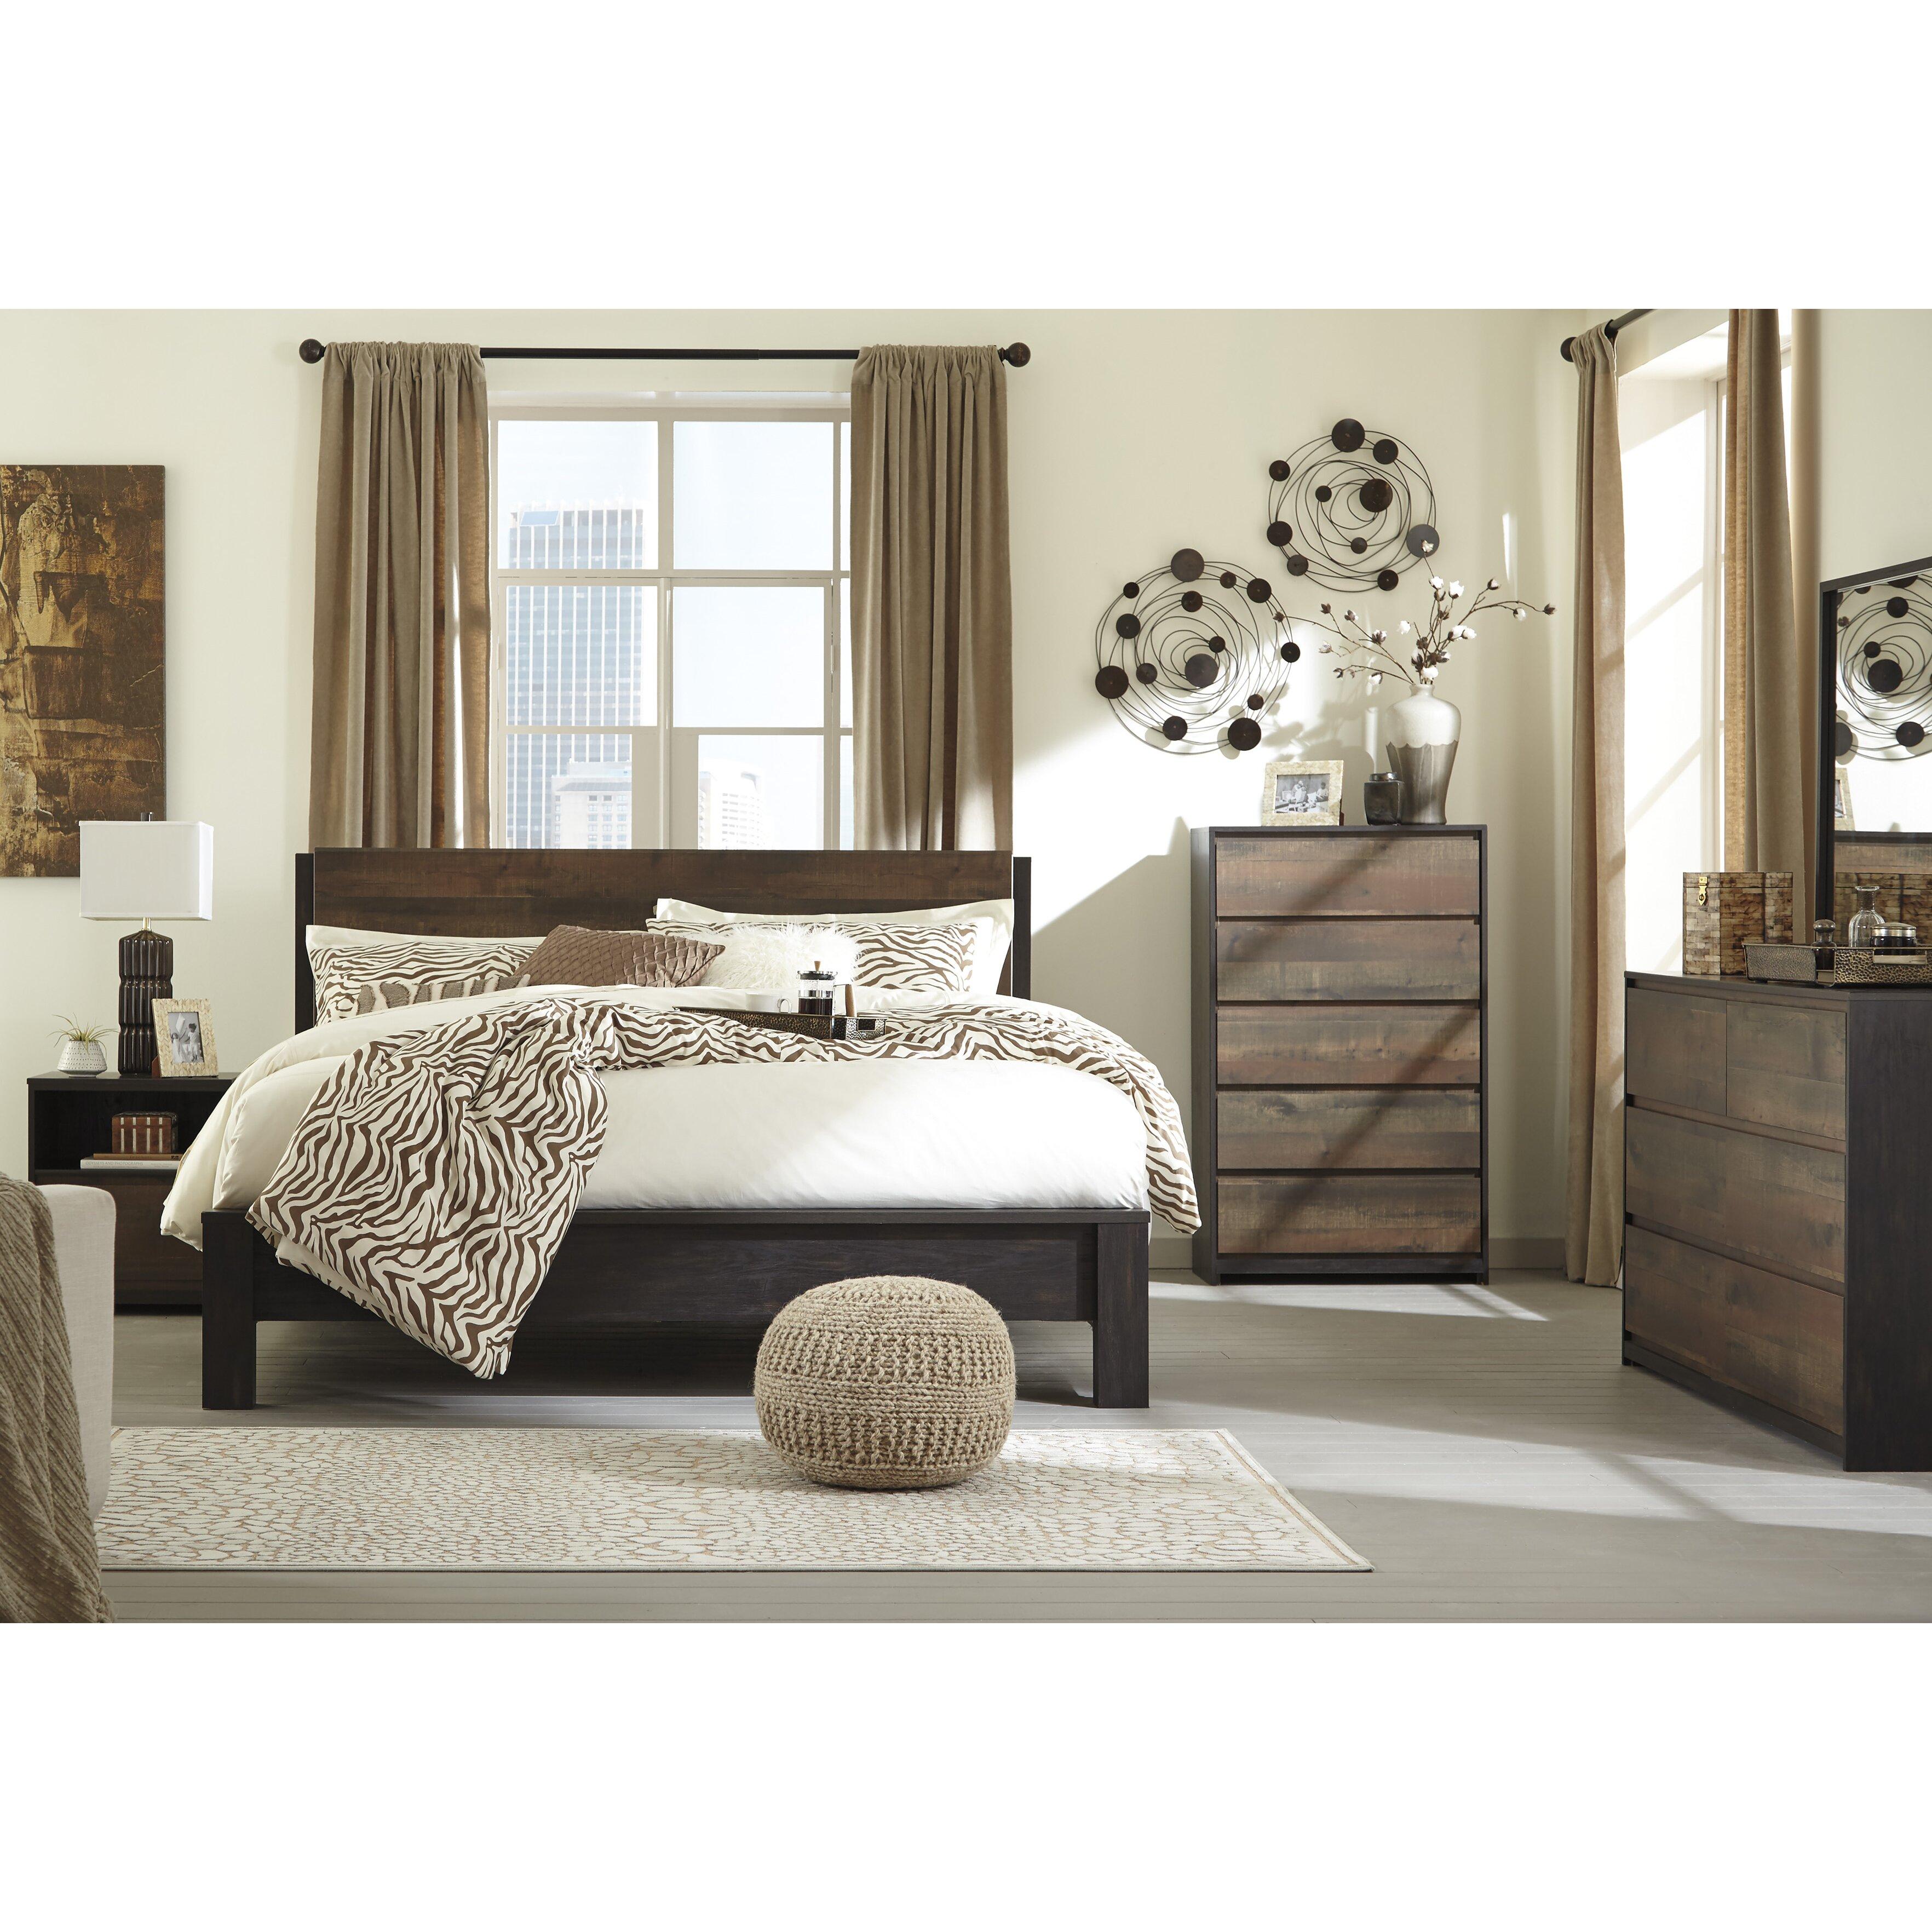 King Size Bedroom Sets Austin Tx Home Decor